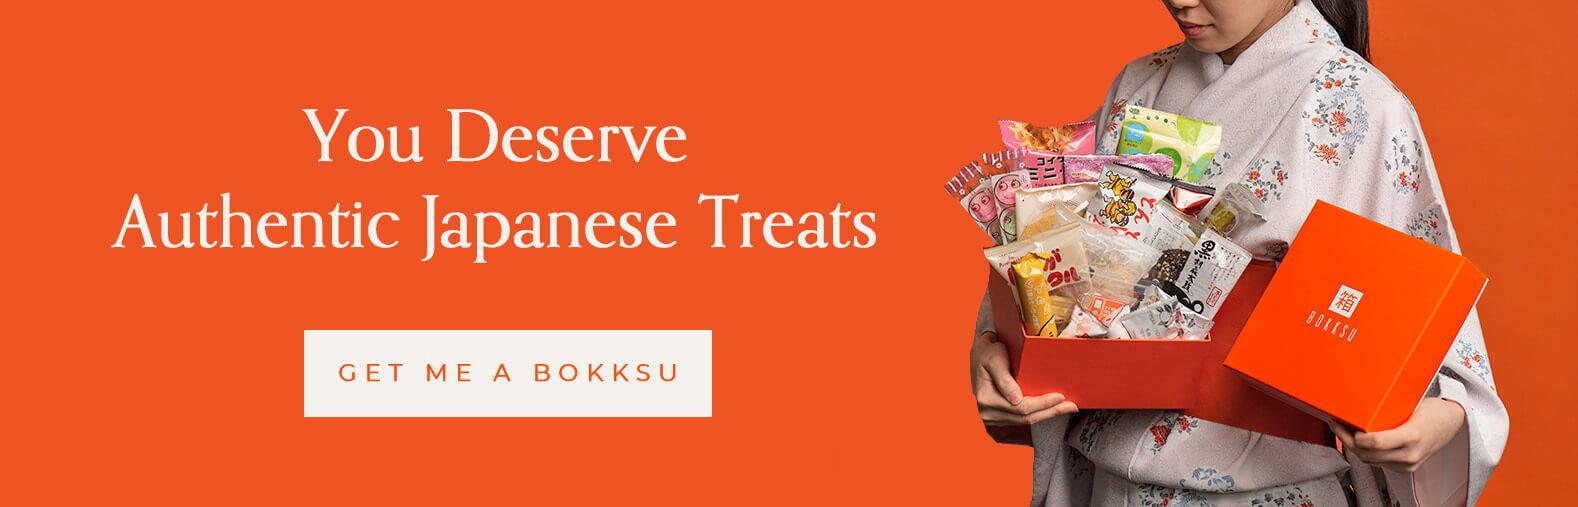 join Bokksu japanese snacks subscription box service